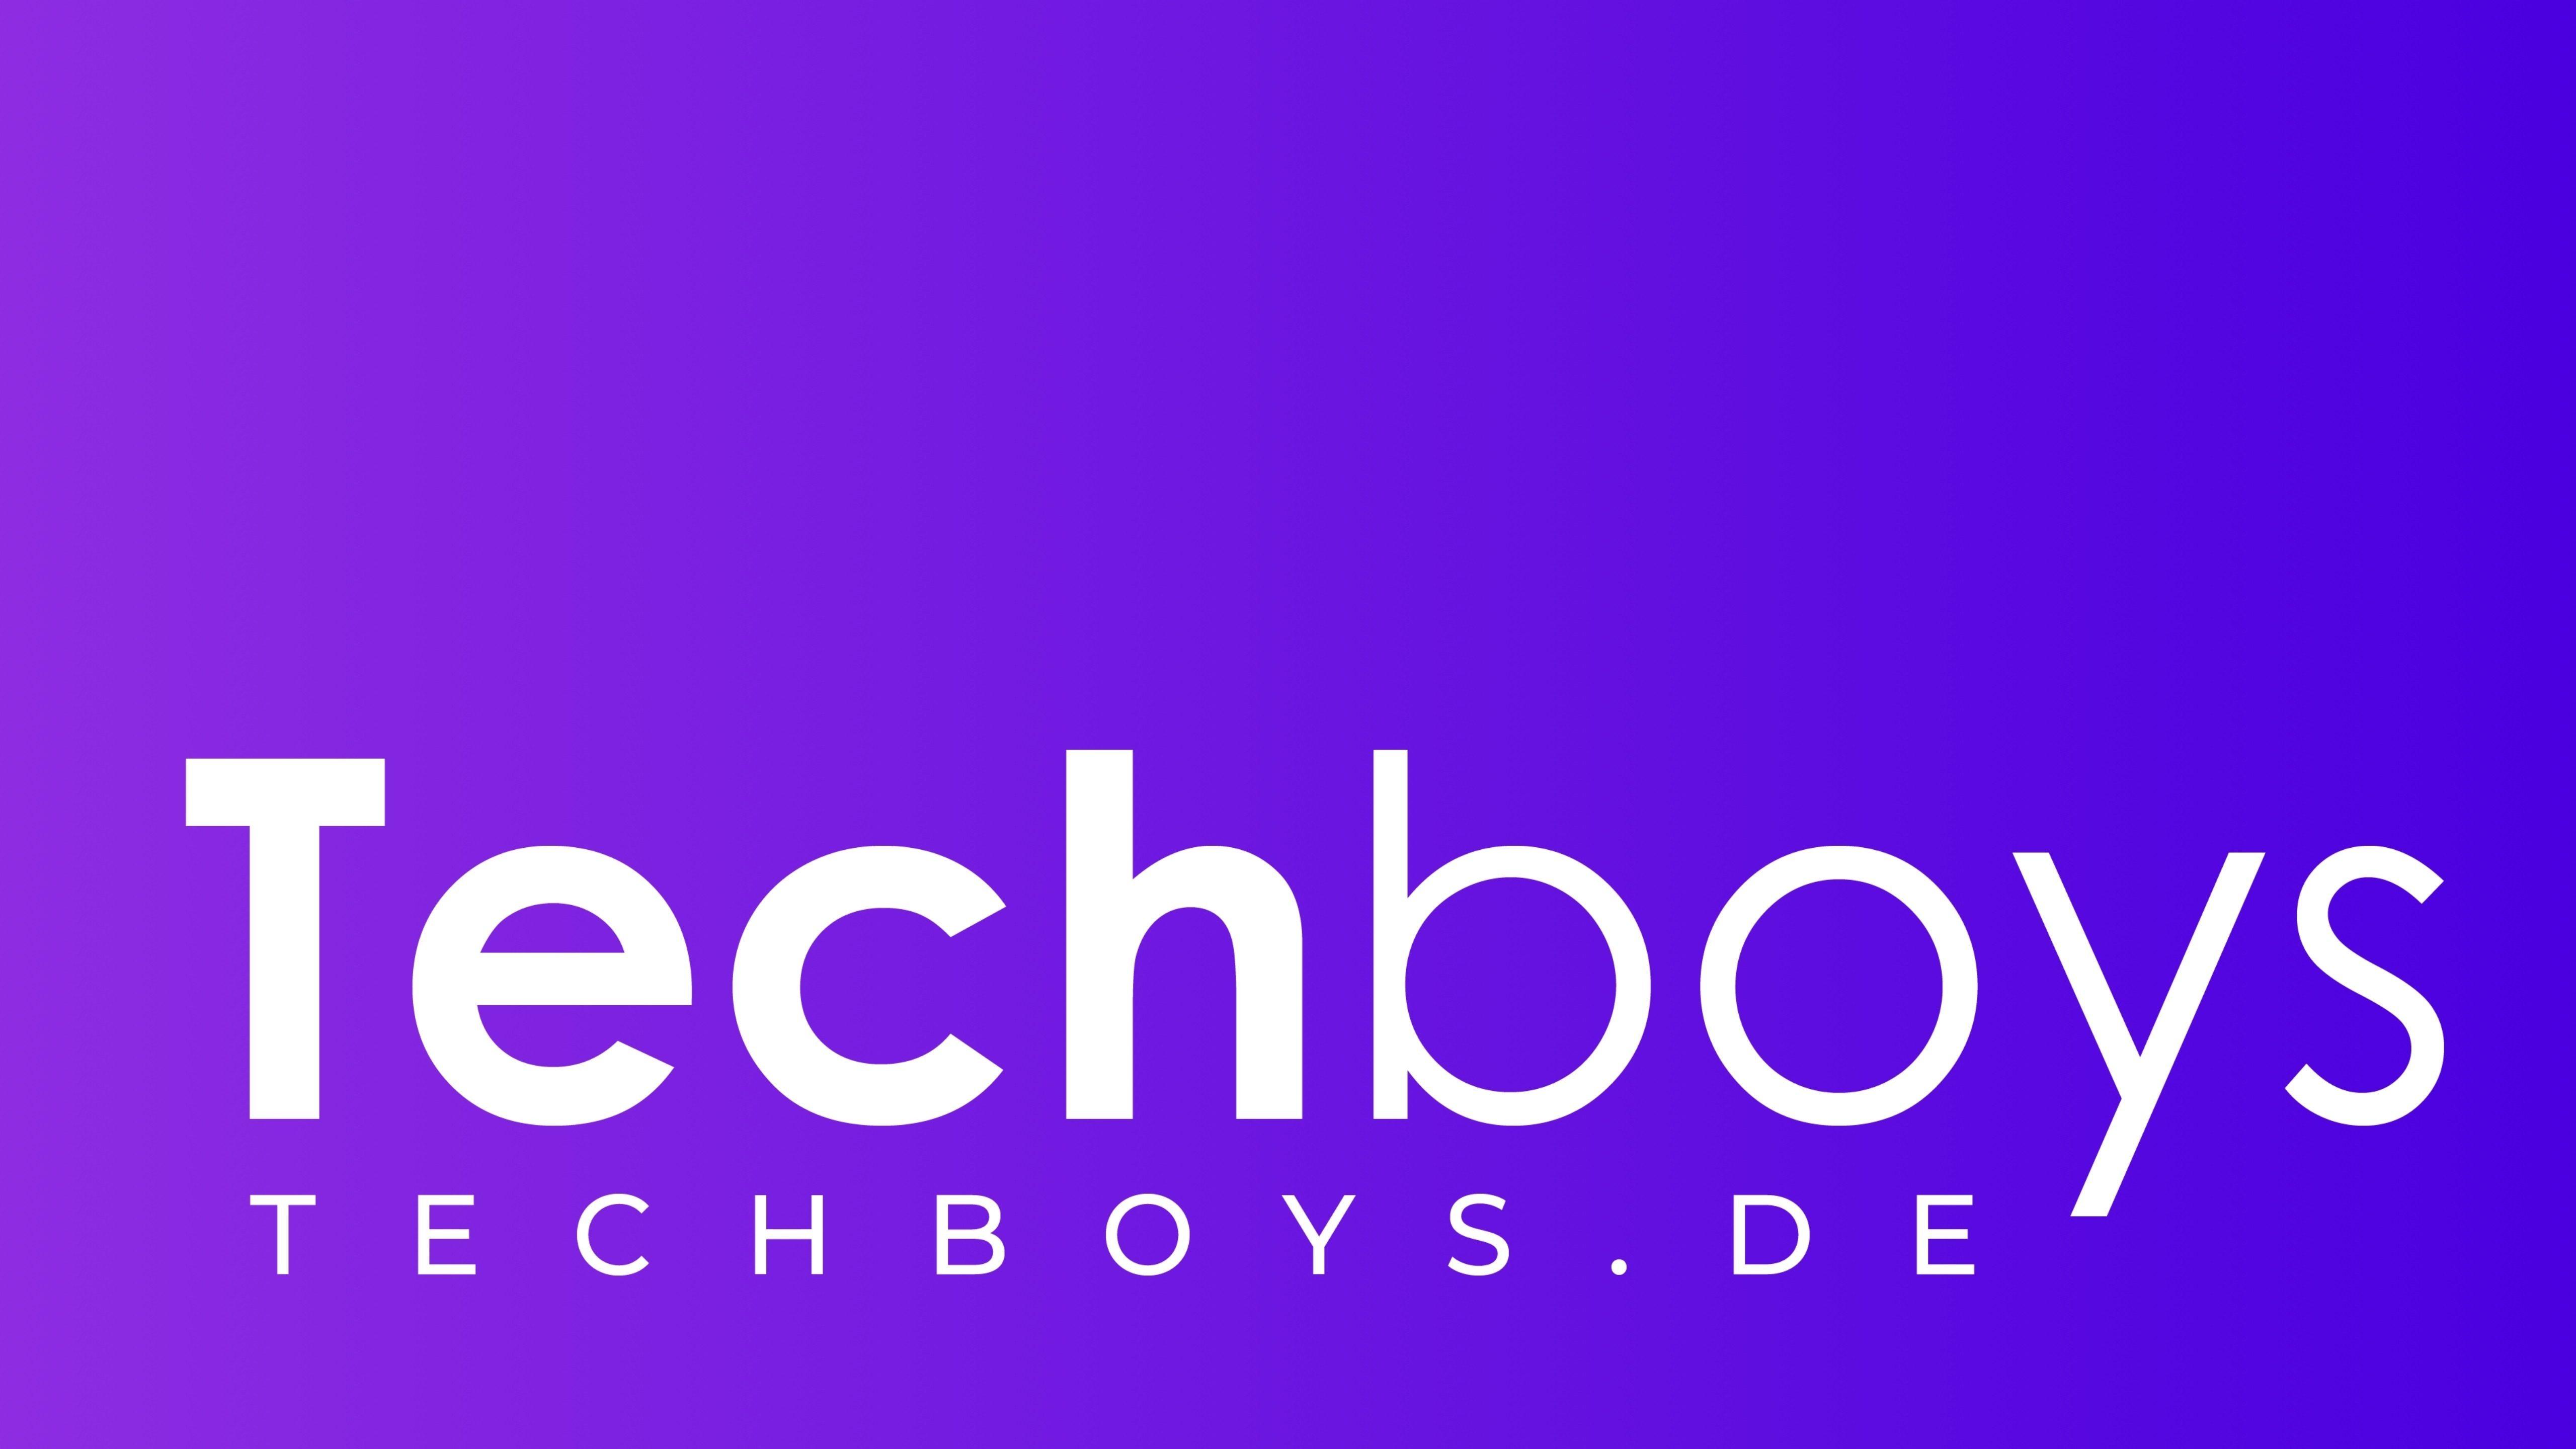 Team 10 techboys.de • smarte News, auf den Punkt! Team